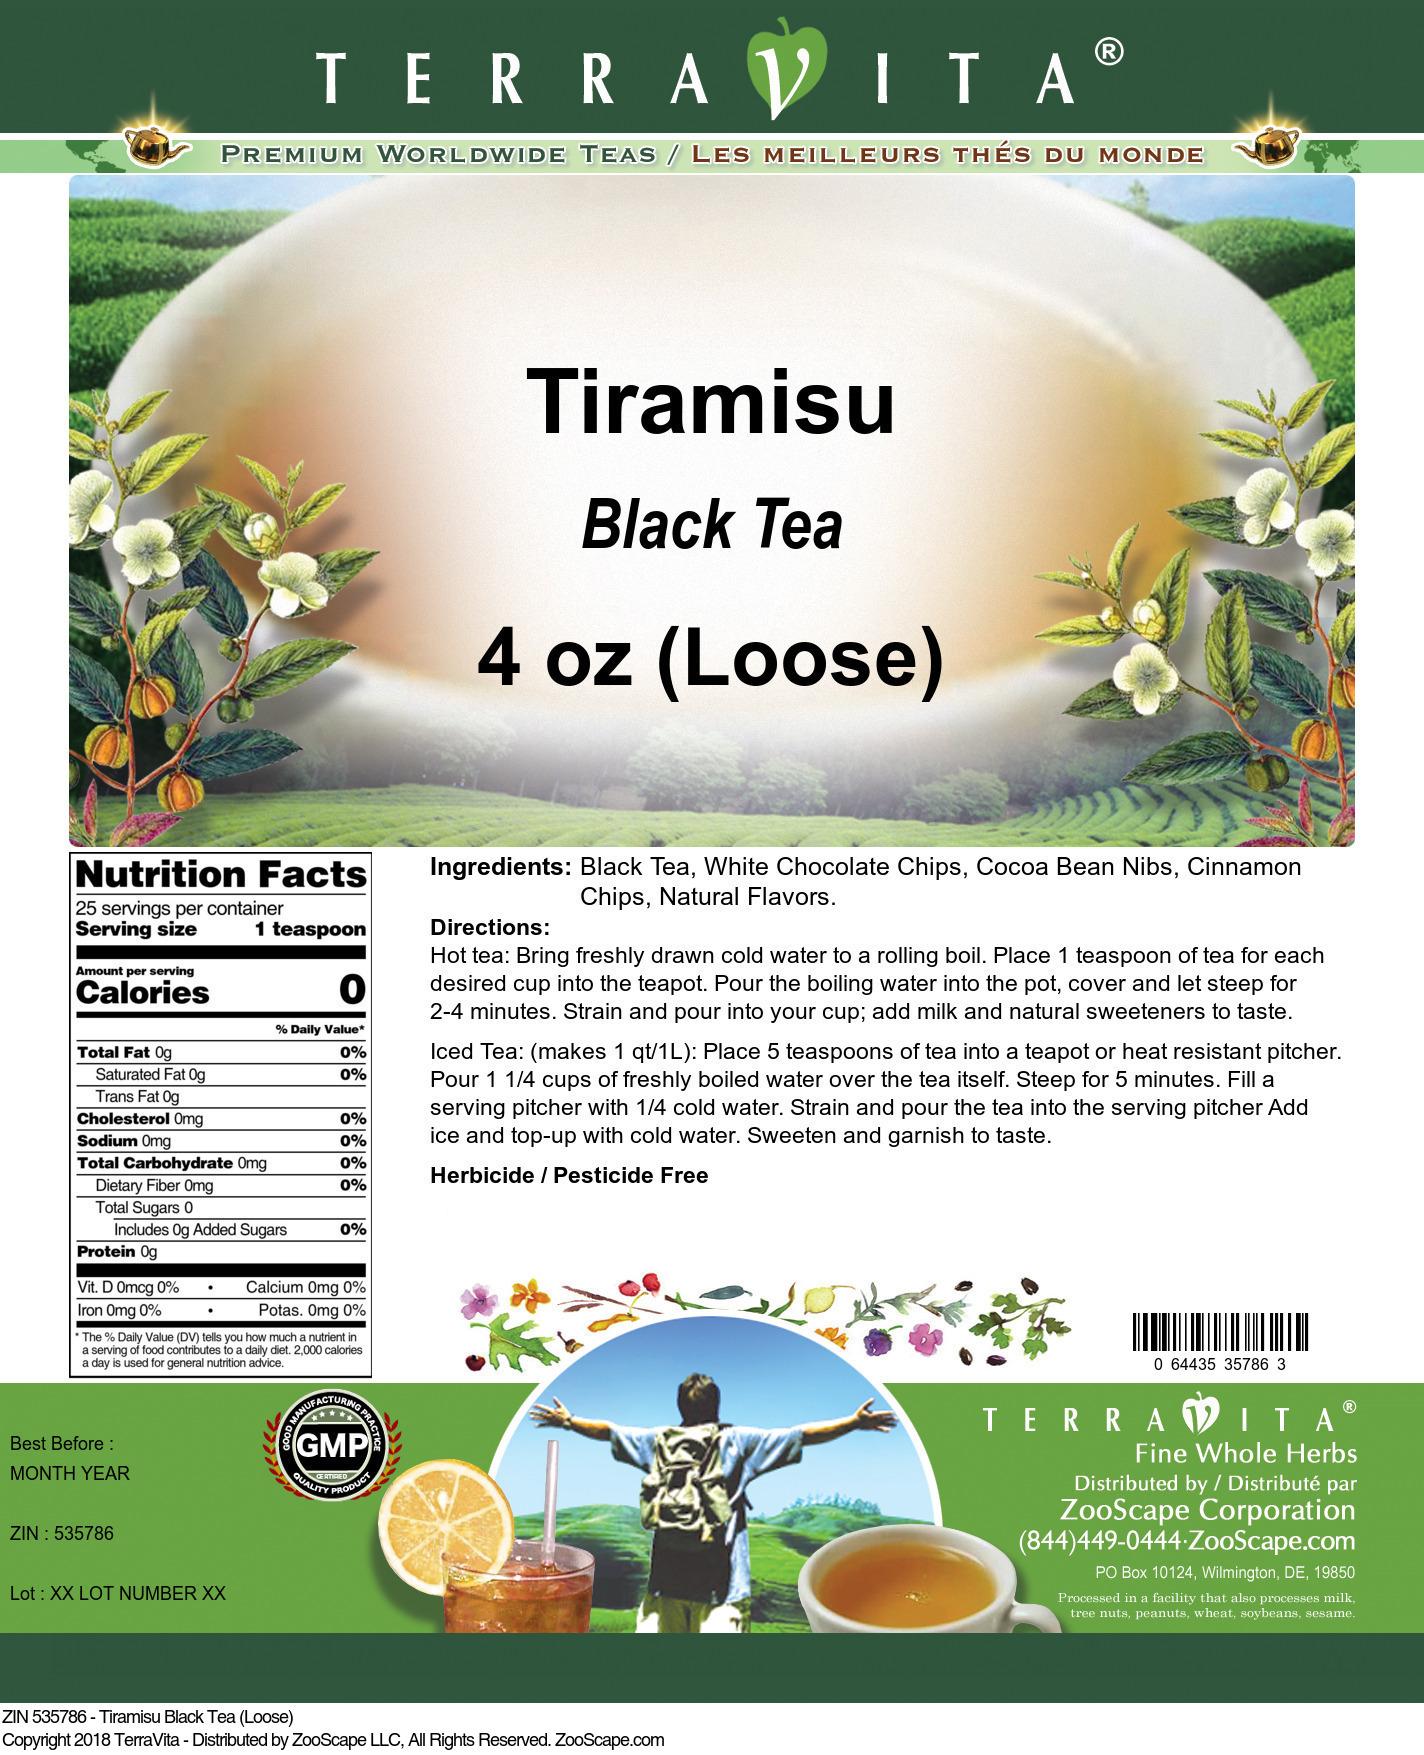 Tiramisu Black Tea (Loose)